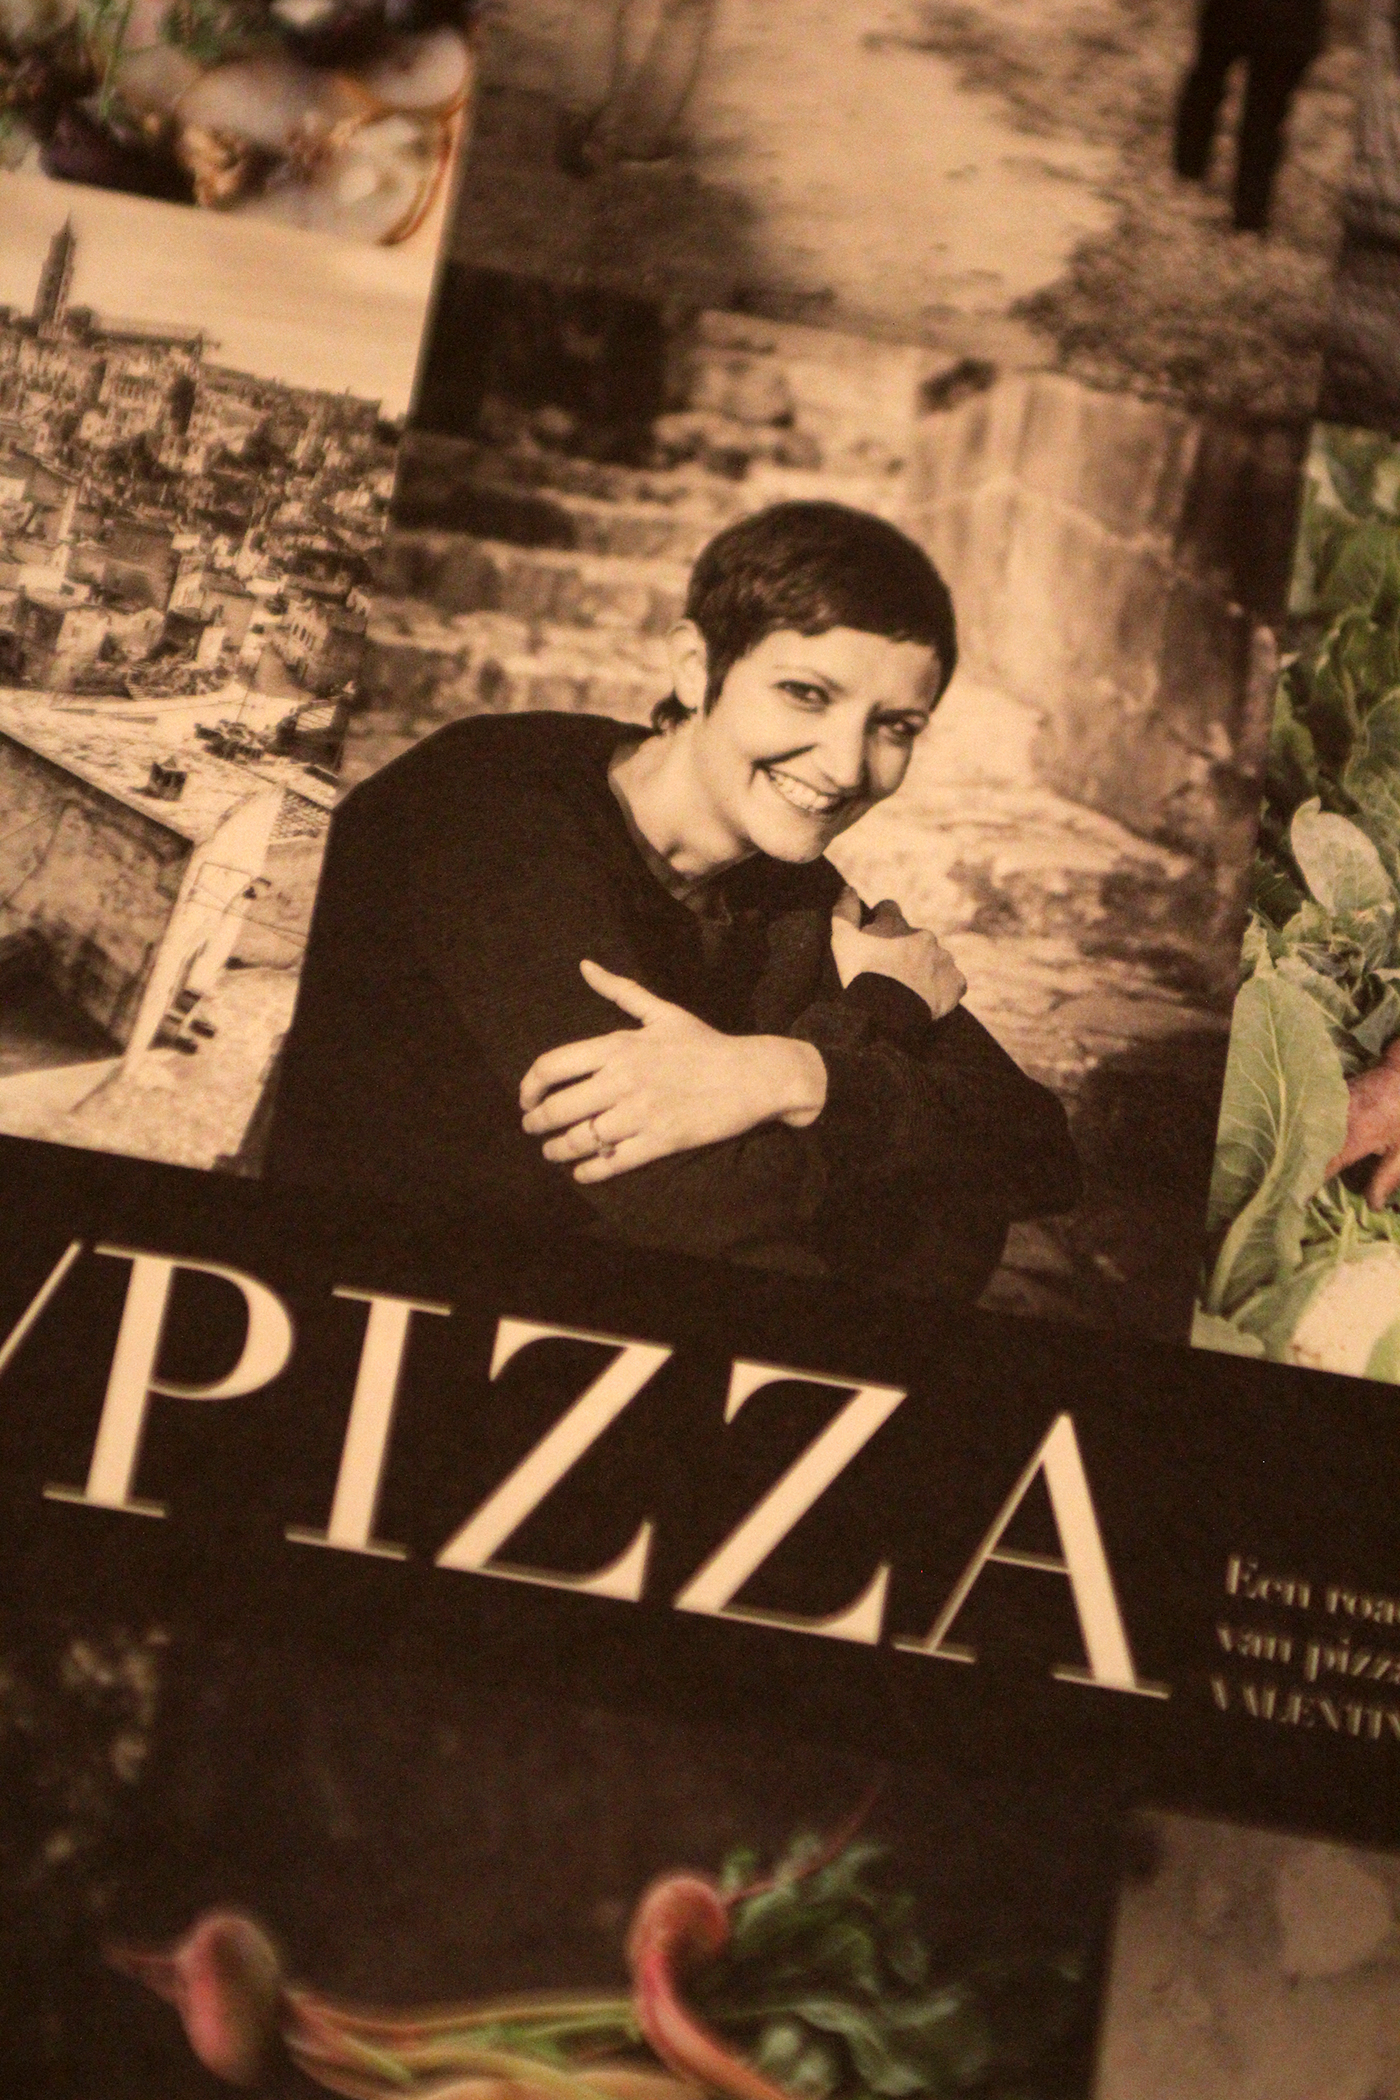 pizzaboek